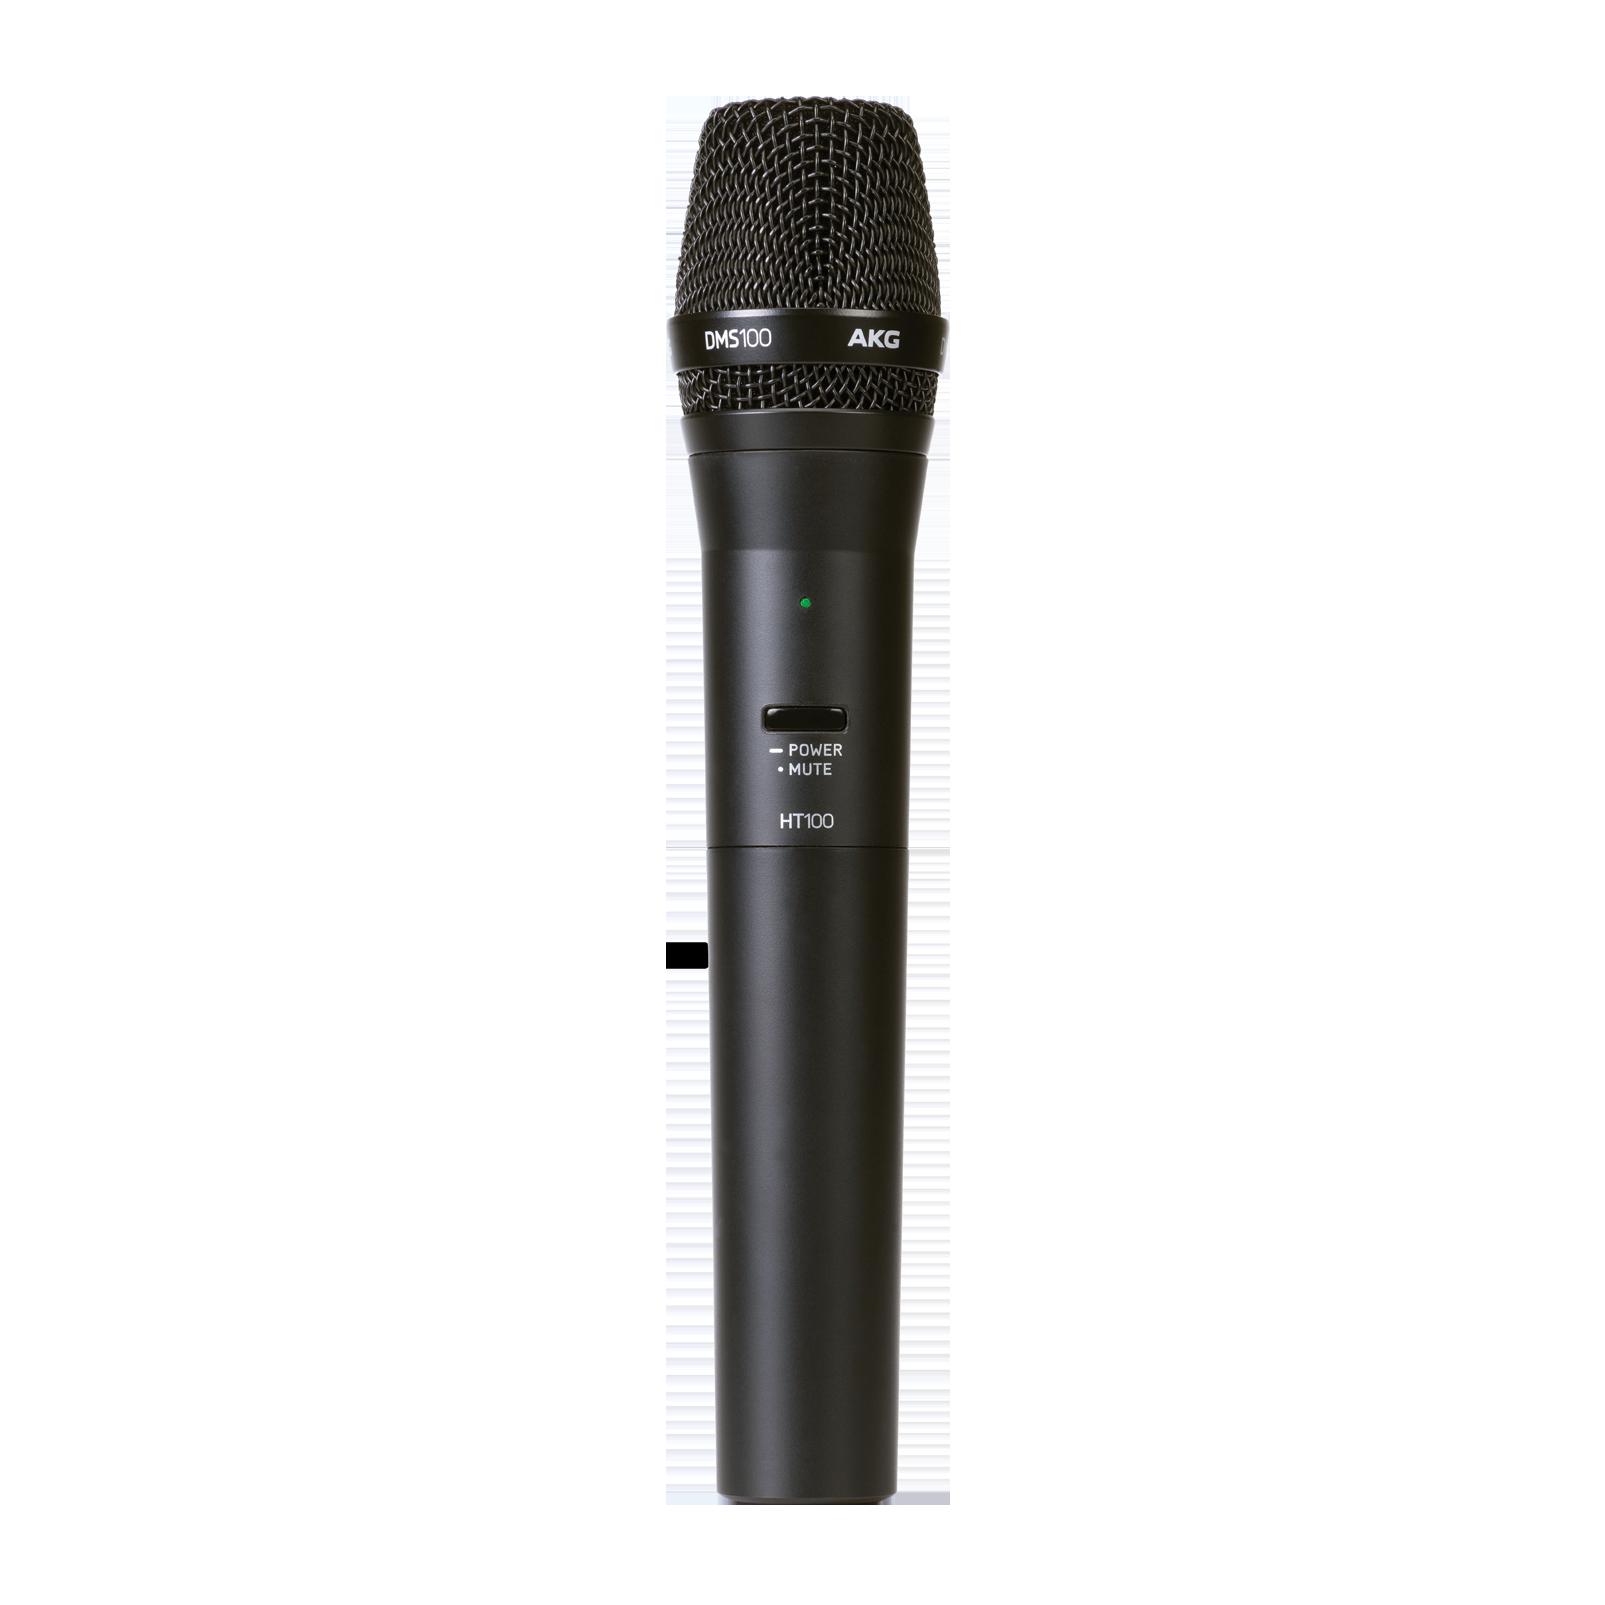 DMS100 Microphone Set - Black - Digital wireless microphone system - Detailshot 1